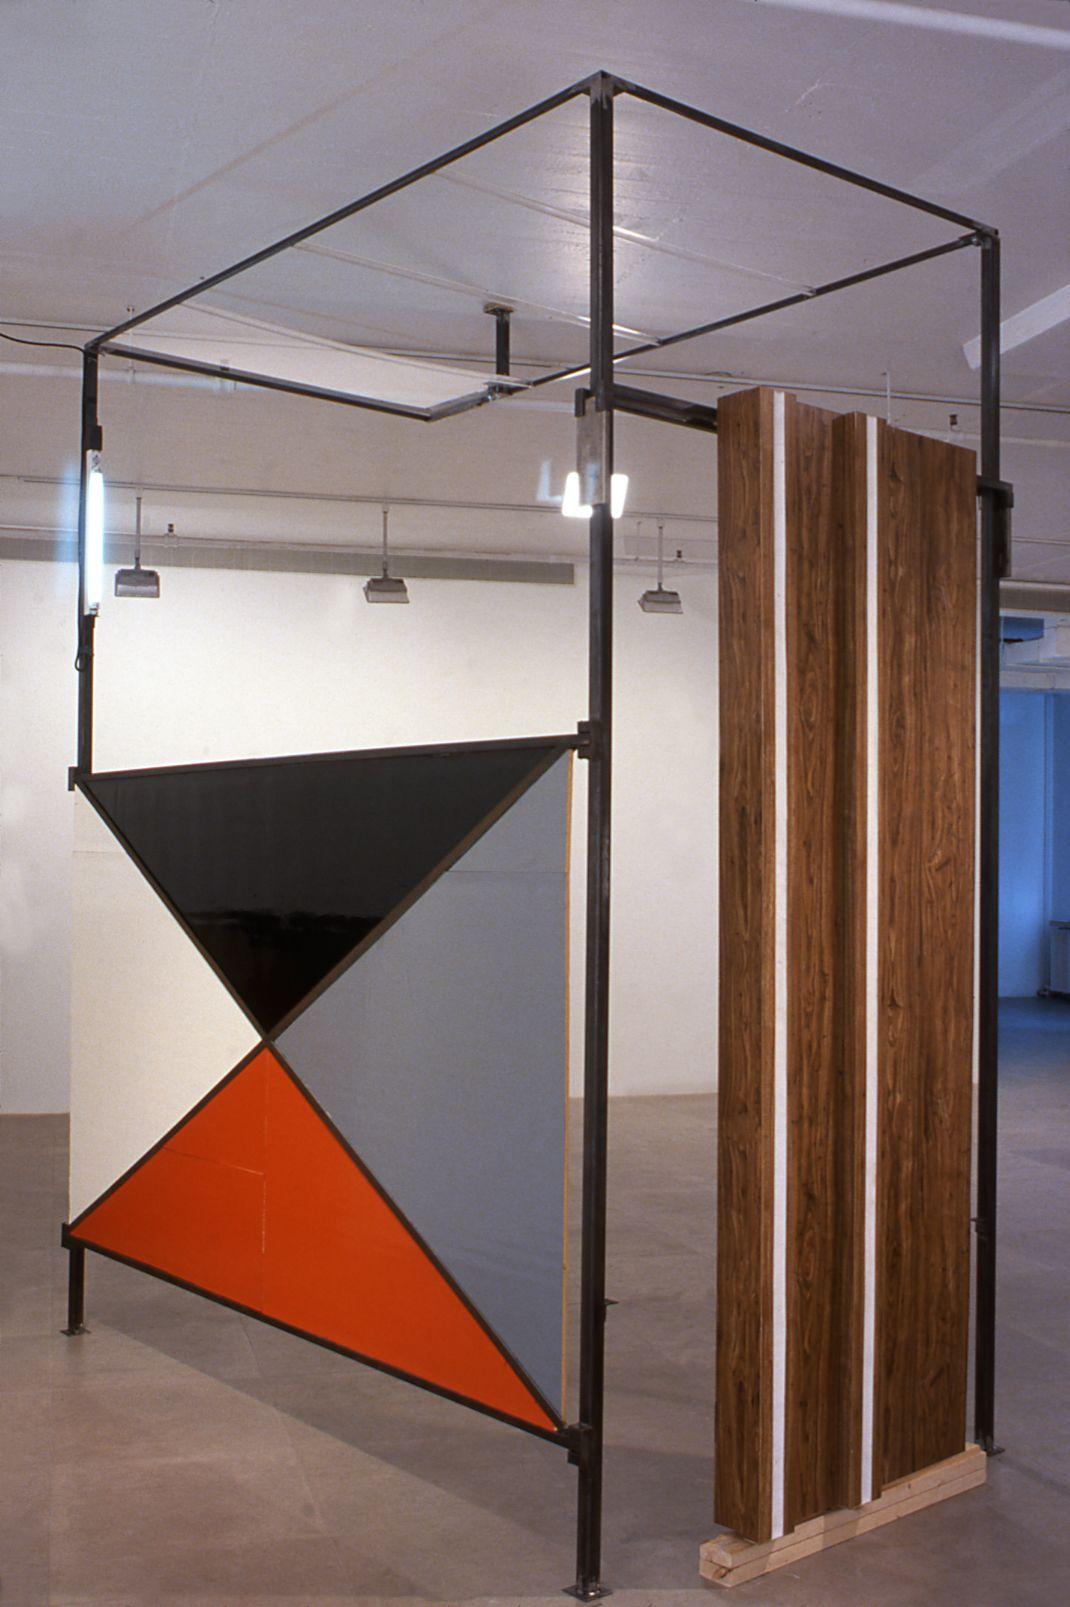 Heidie Gianotti, When Suburban Living Was Good, 2001 (detail), Steel, plexi, insulation, caulking, vinyl, super 8 film, Dimensions variable